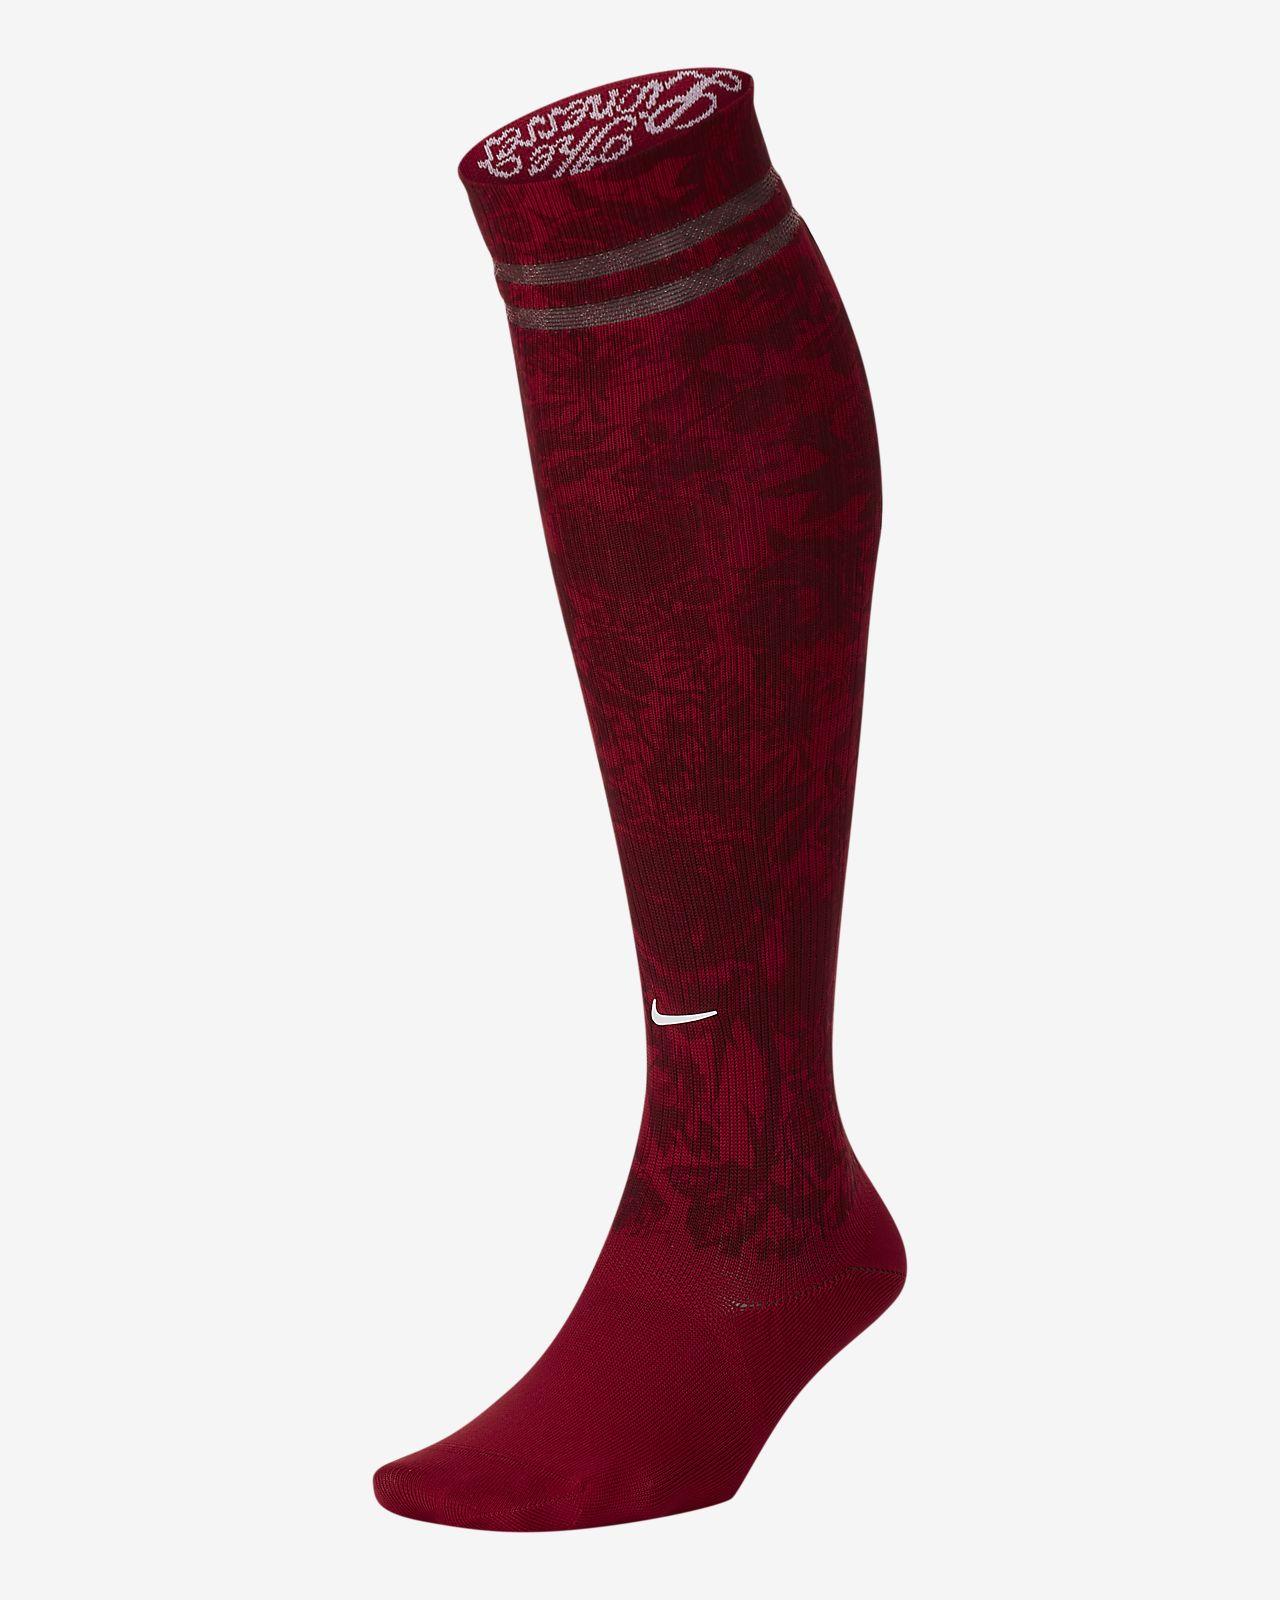 England 2019 Squad Women's Knee-High Football Socks